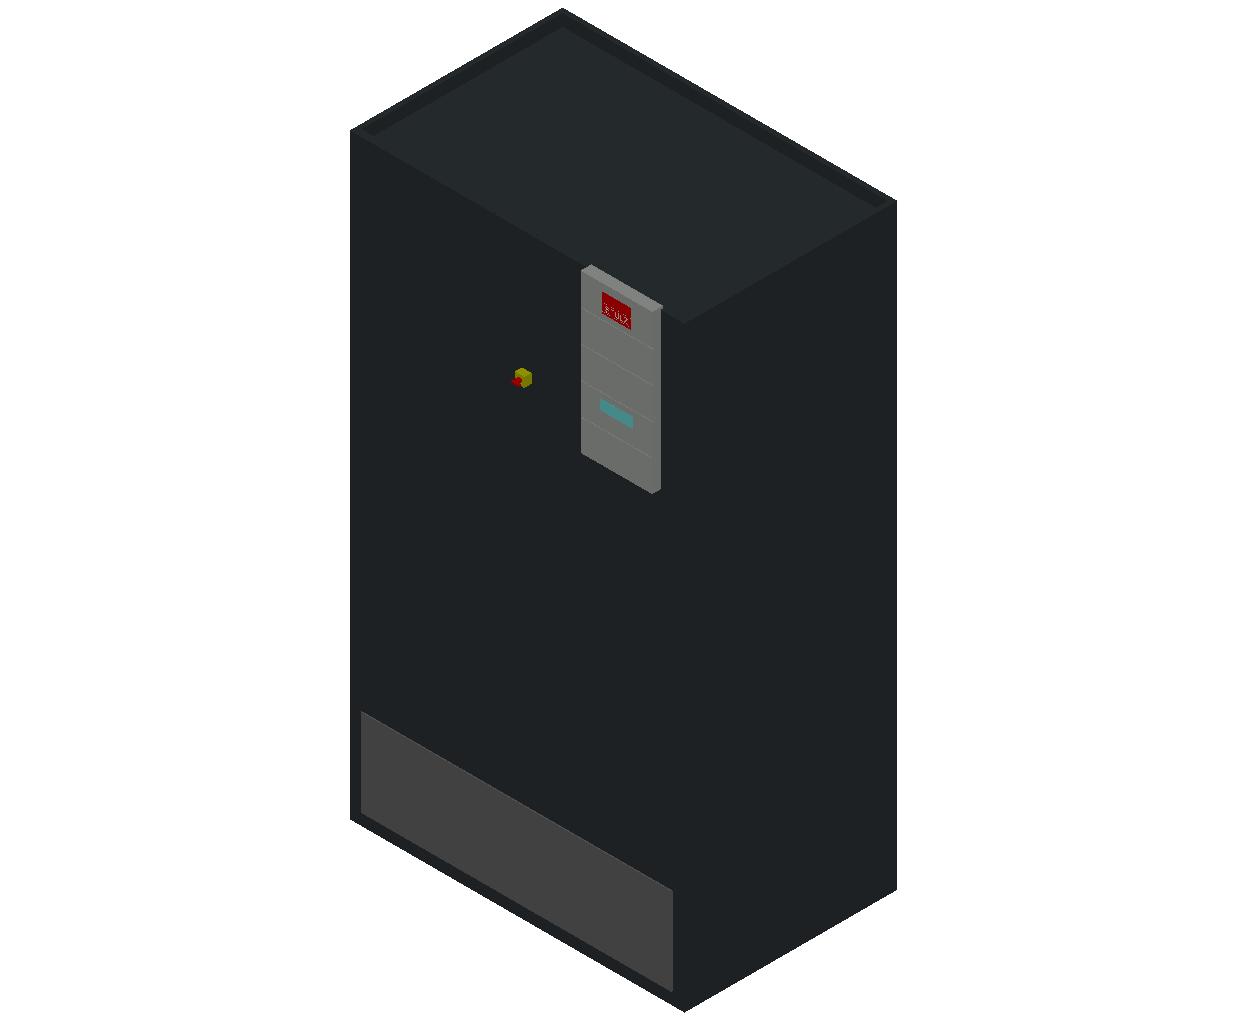 HC_Air Conditioner_Indoor Unit_MEPcontent_STULZ_CyberAir 3PRO_ASR_CW2_ASR_580_CW2_INT-EN.dwg